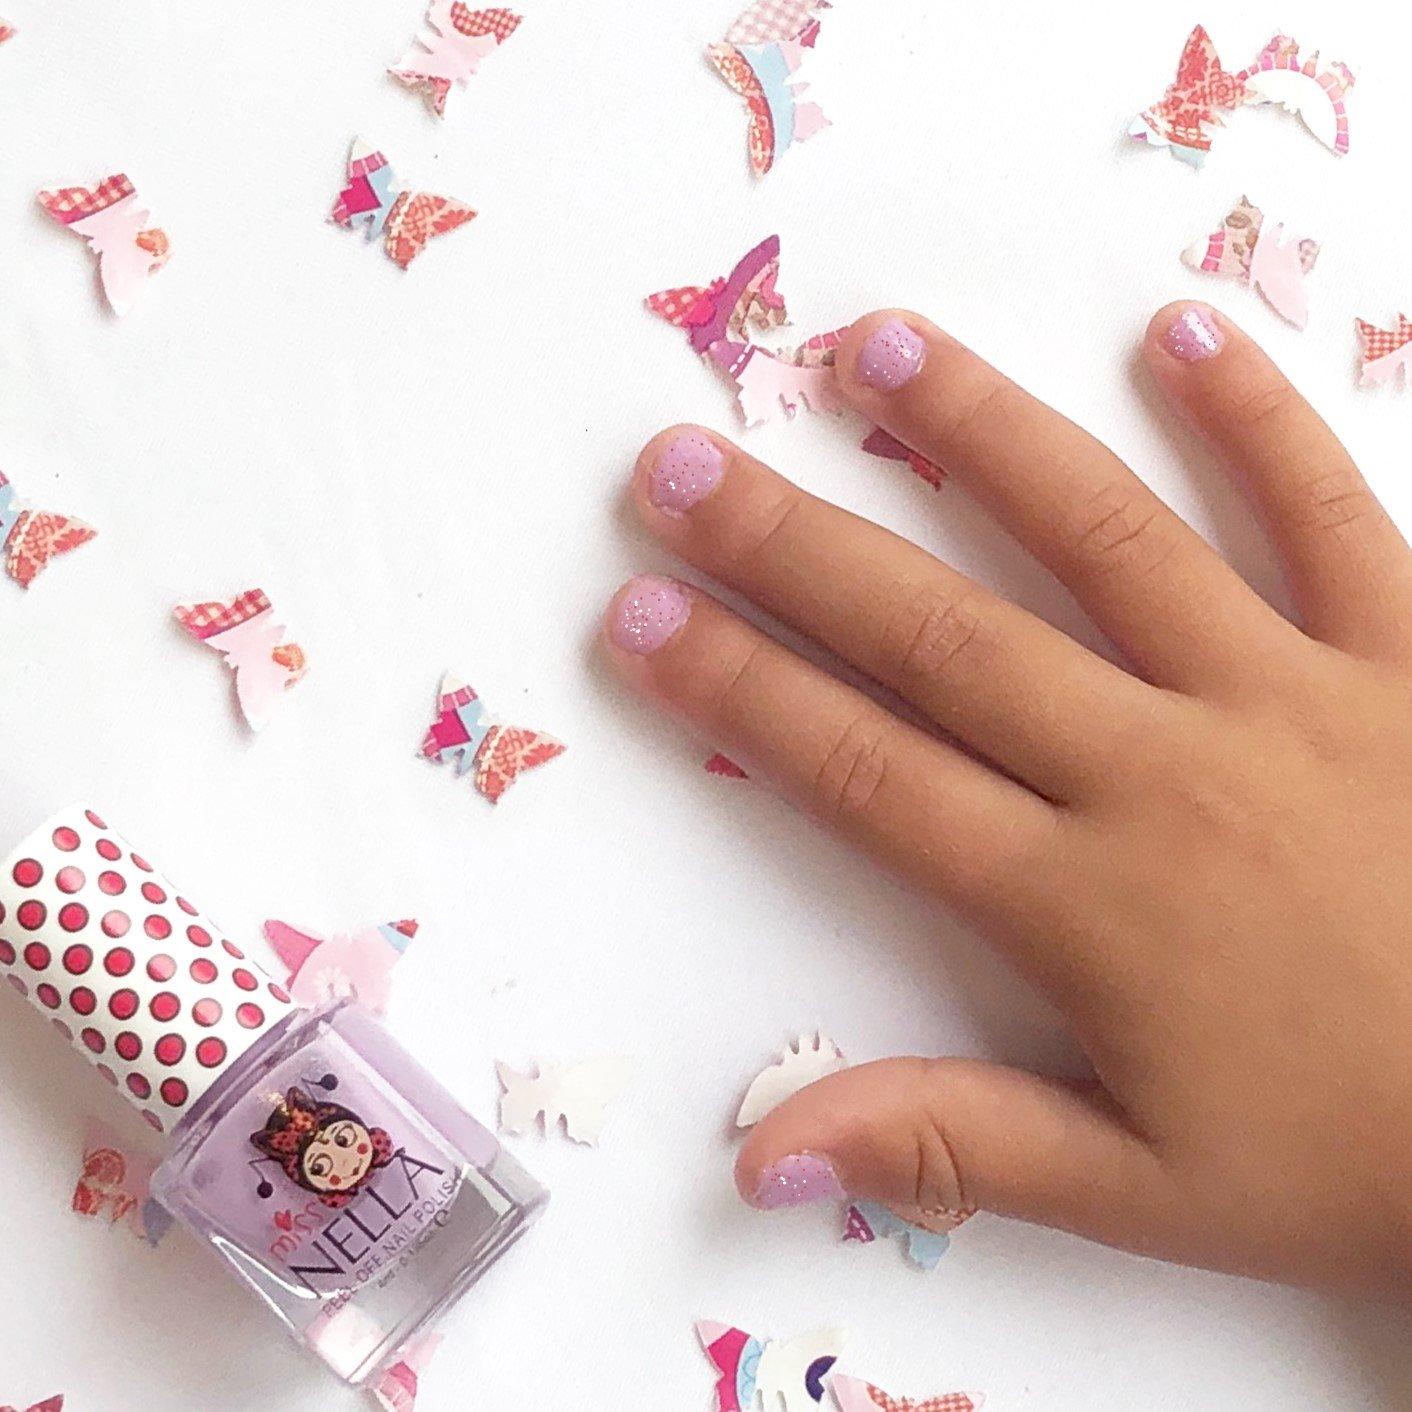 Miss Nella Butterfly Wings Peel Off Nail Polish